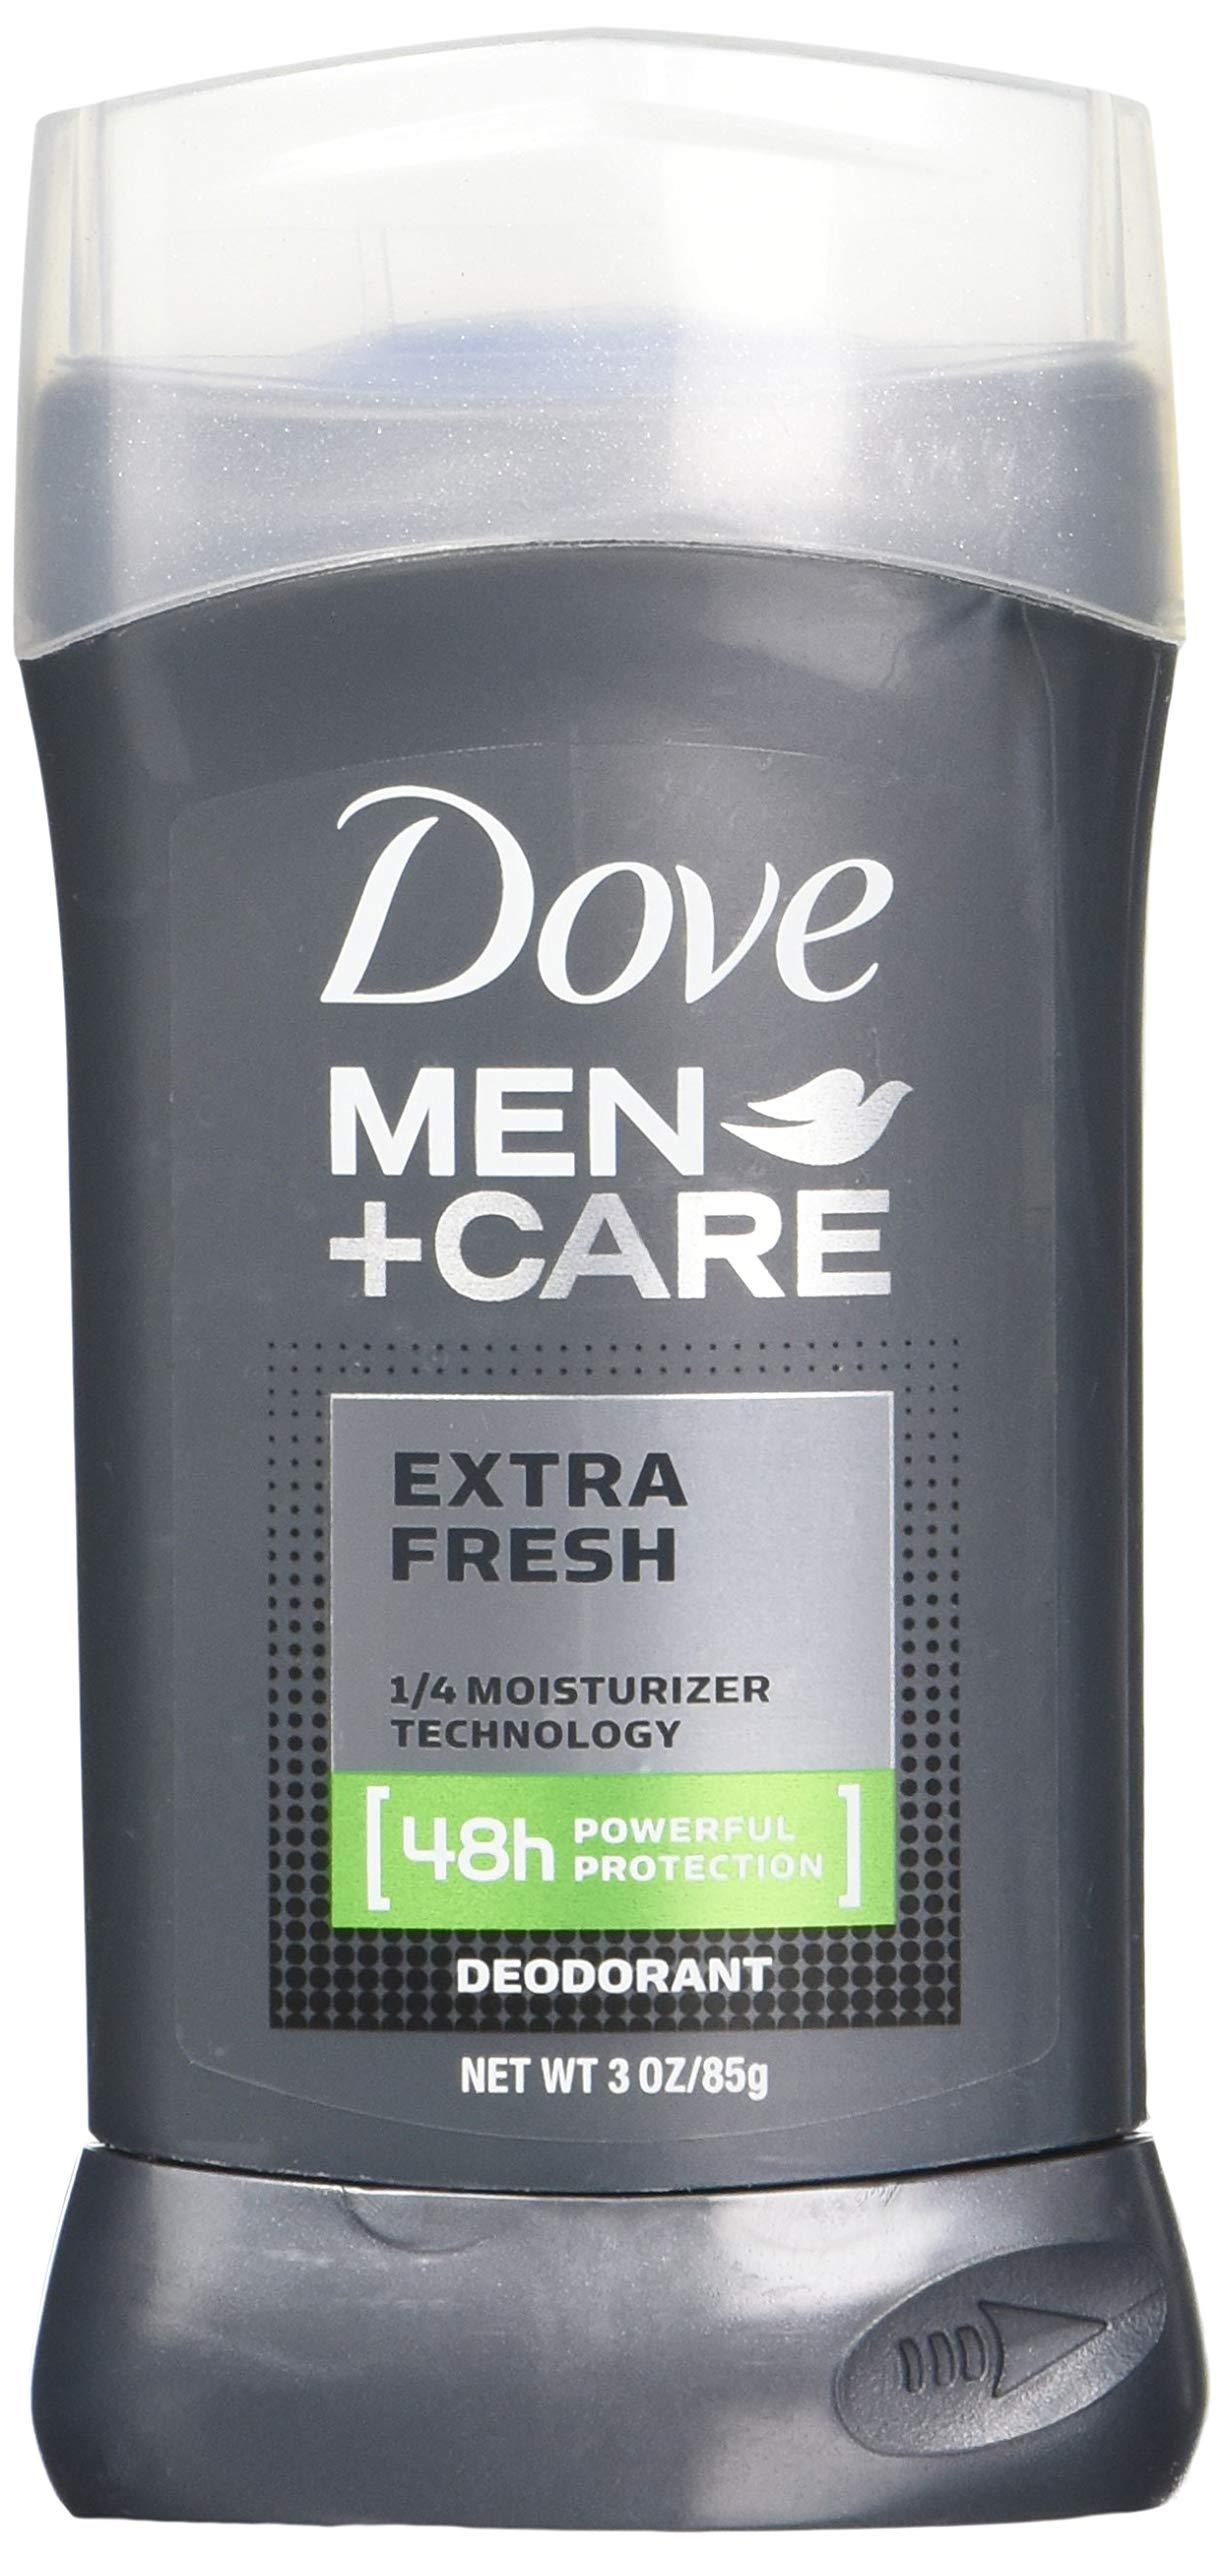 Dove Men+Care Deodorant Stick, Extra Fresh, 3 Ounce (Pack of 3)